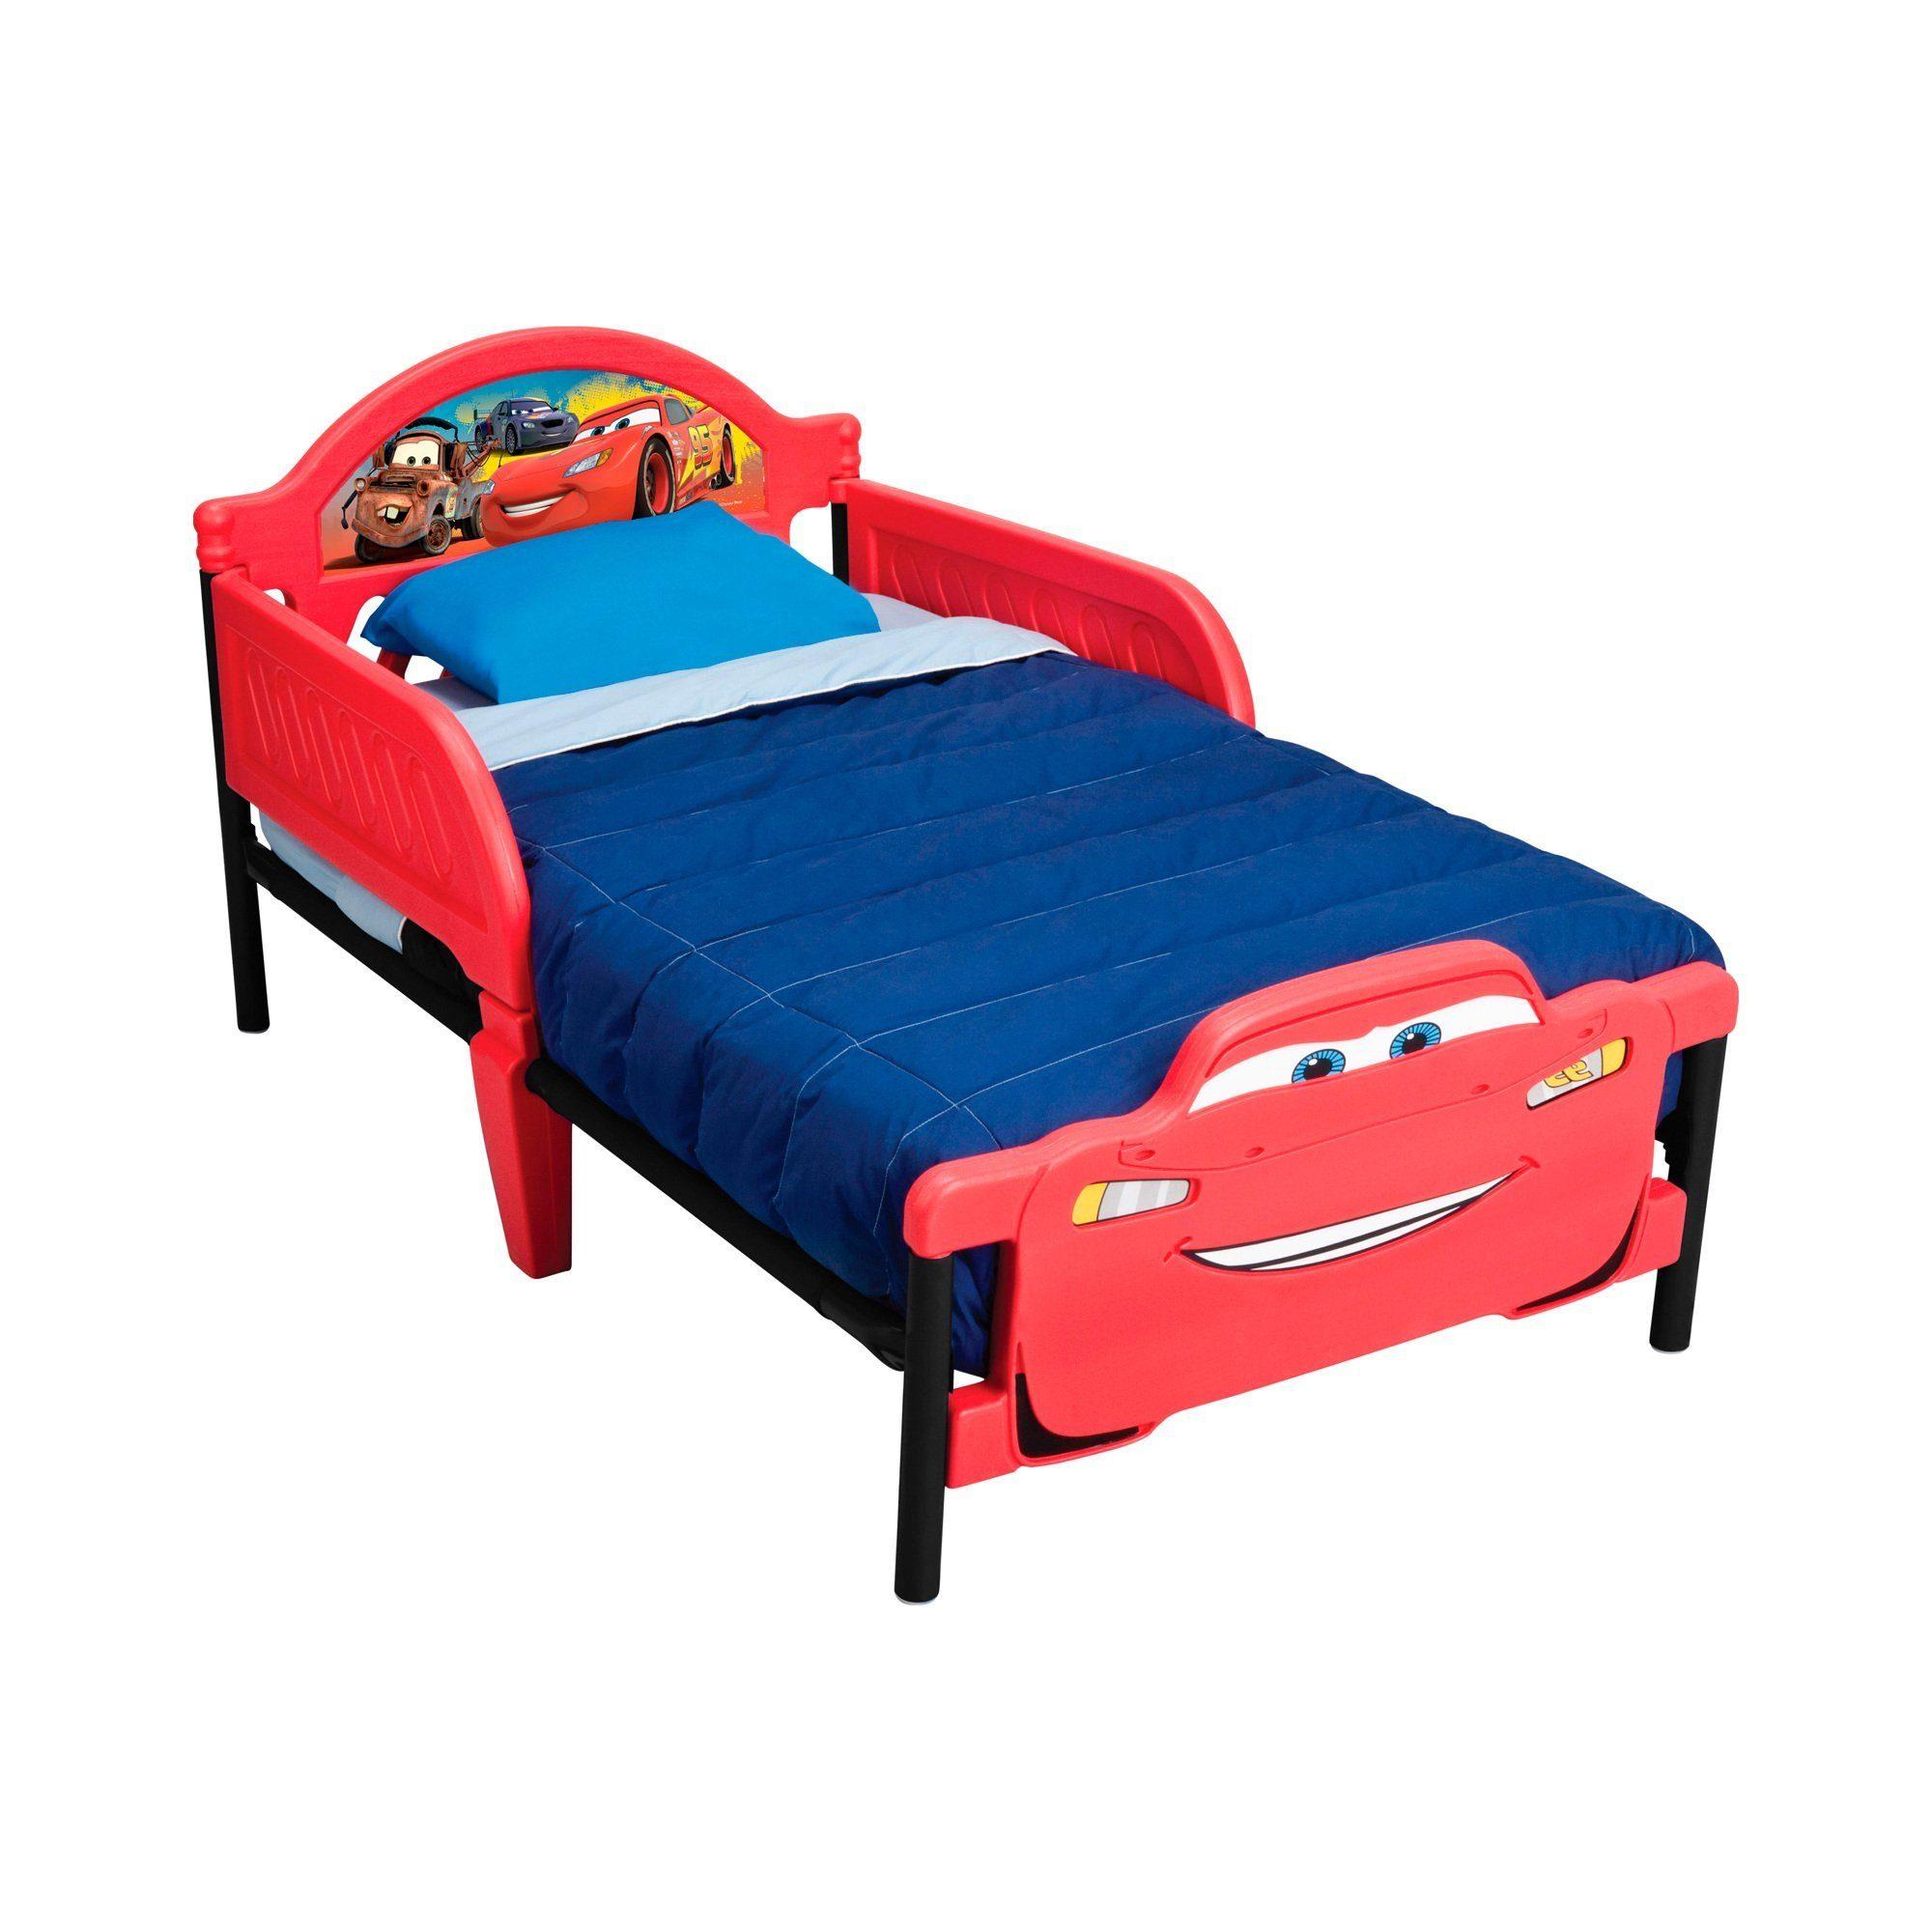 BABY-WALZ Kinderbett 70x140 cm